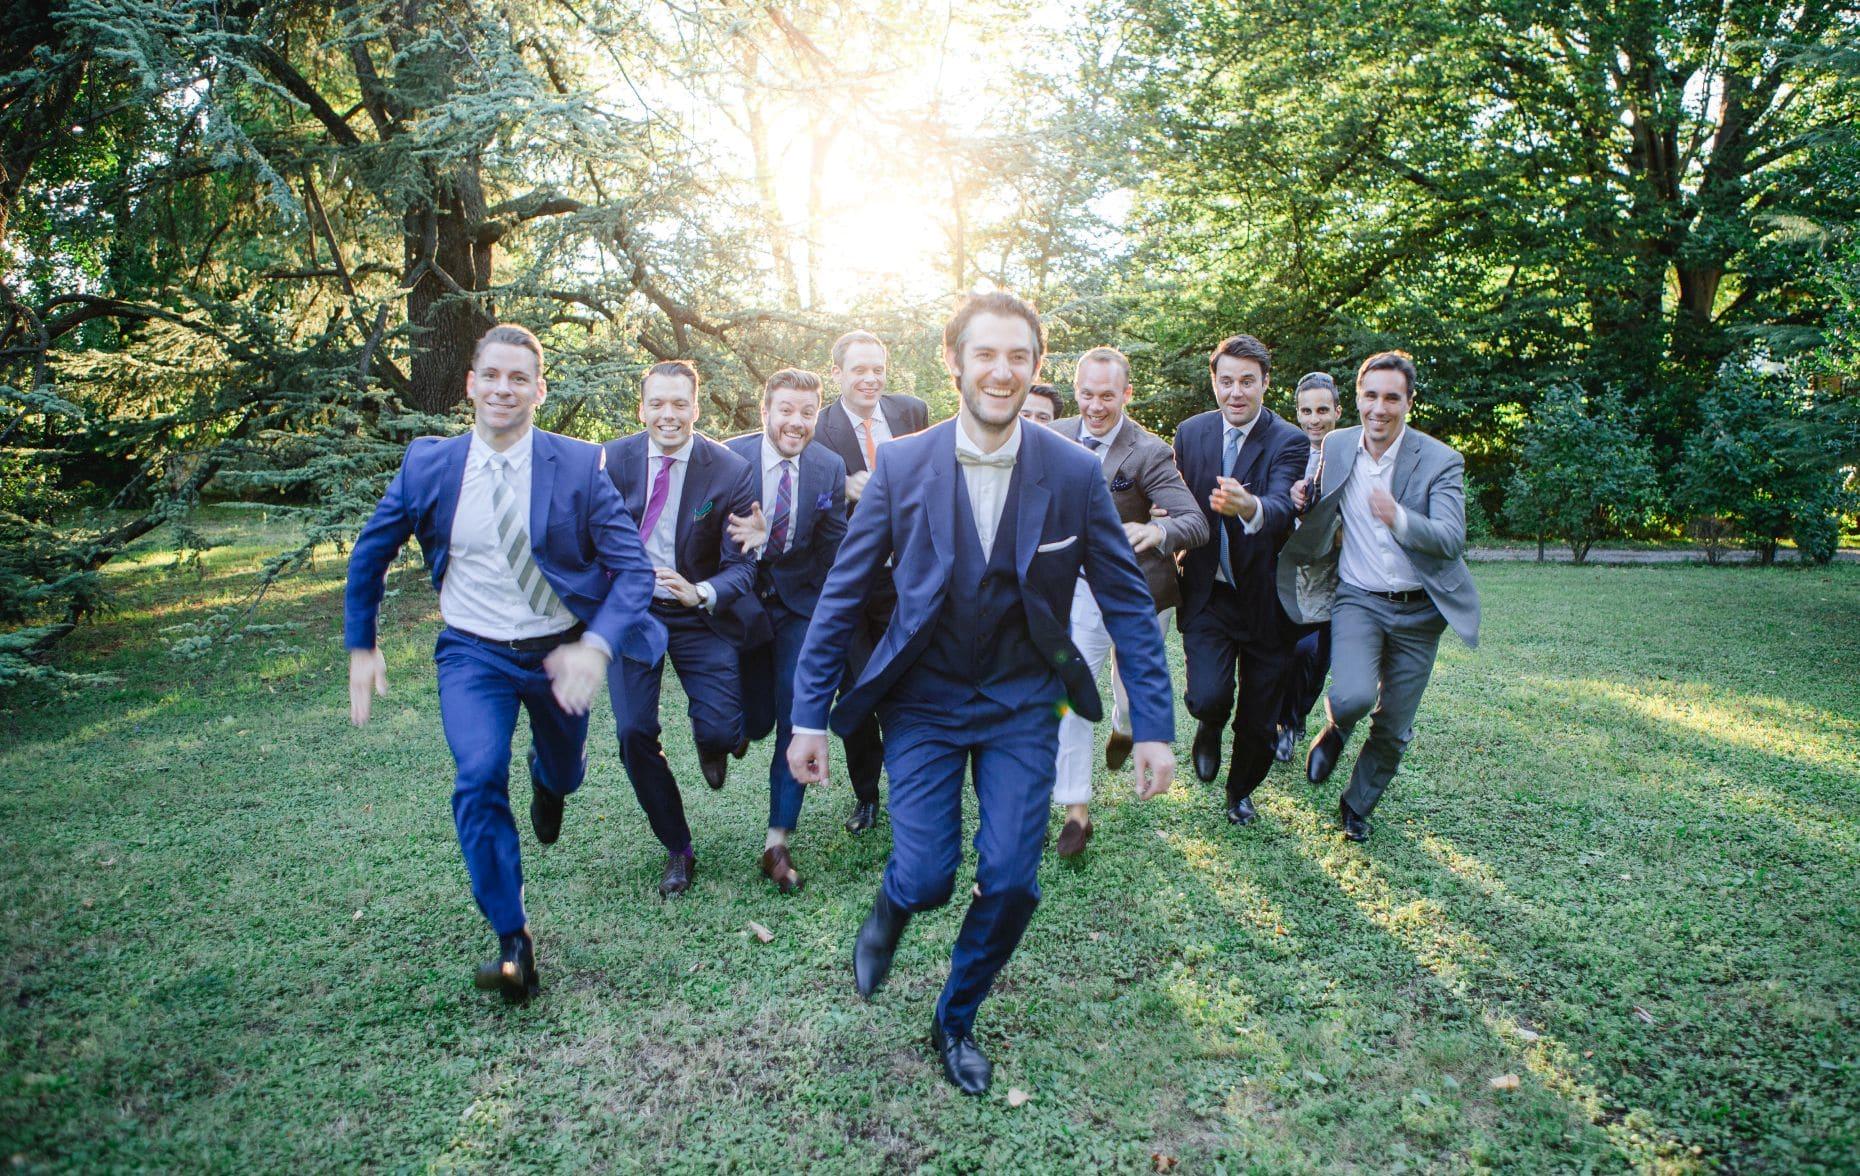 Million Memories_A&D_Hochzeitsfotograf_Schlosshochzeit_Toskana_Lago Di Como_Wedding_Tuscany_157